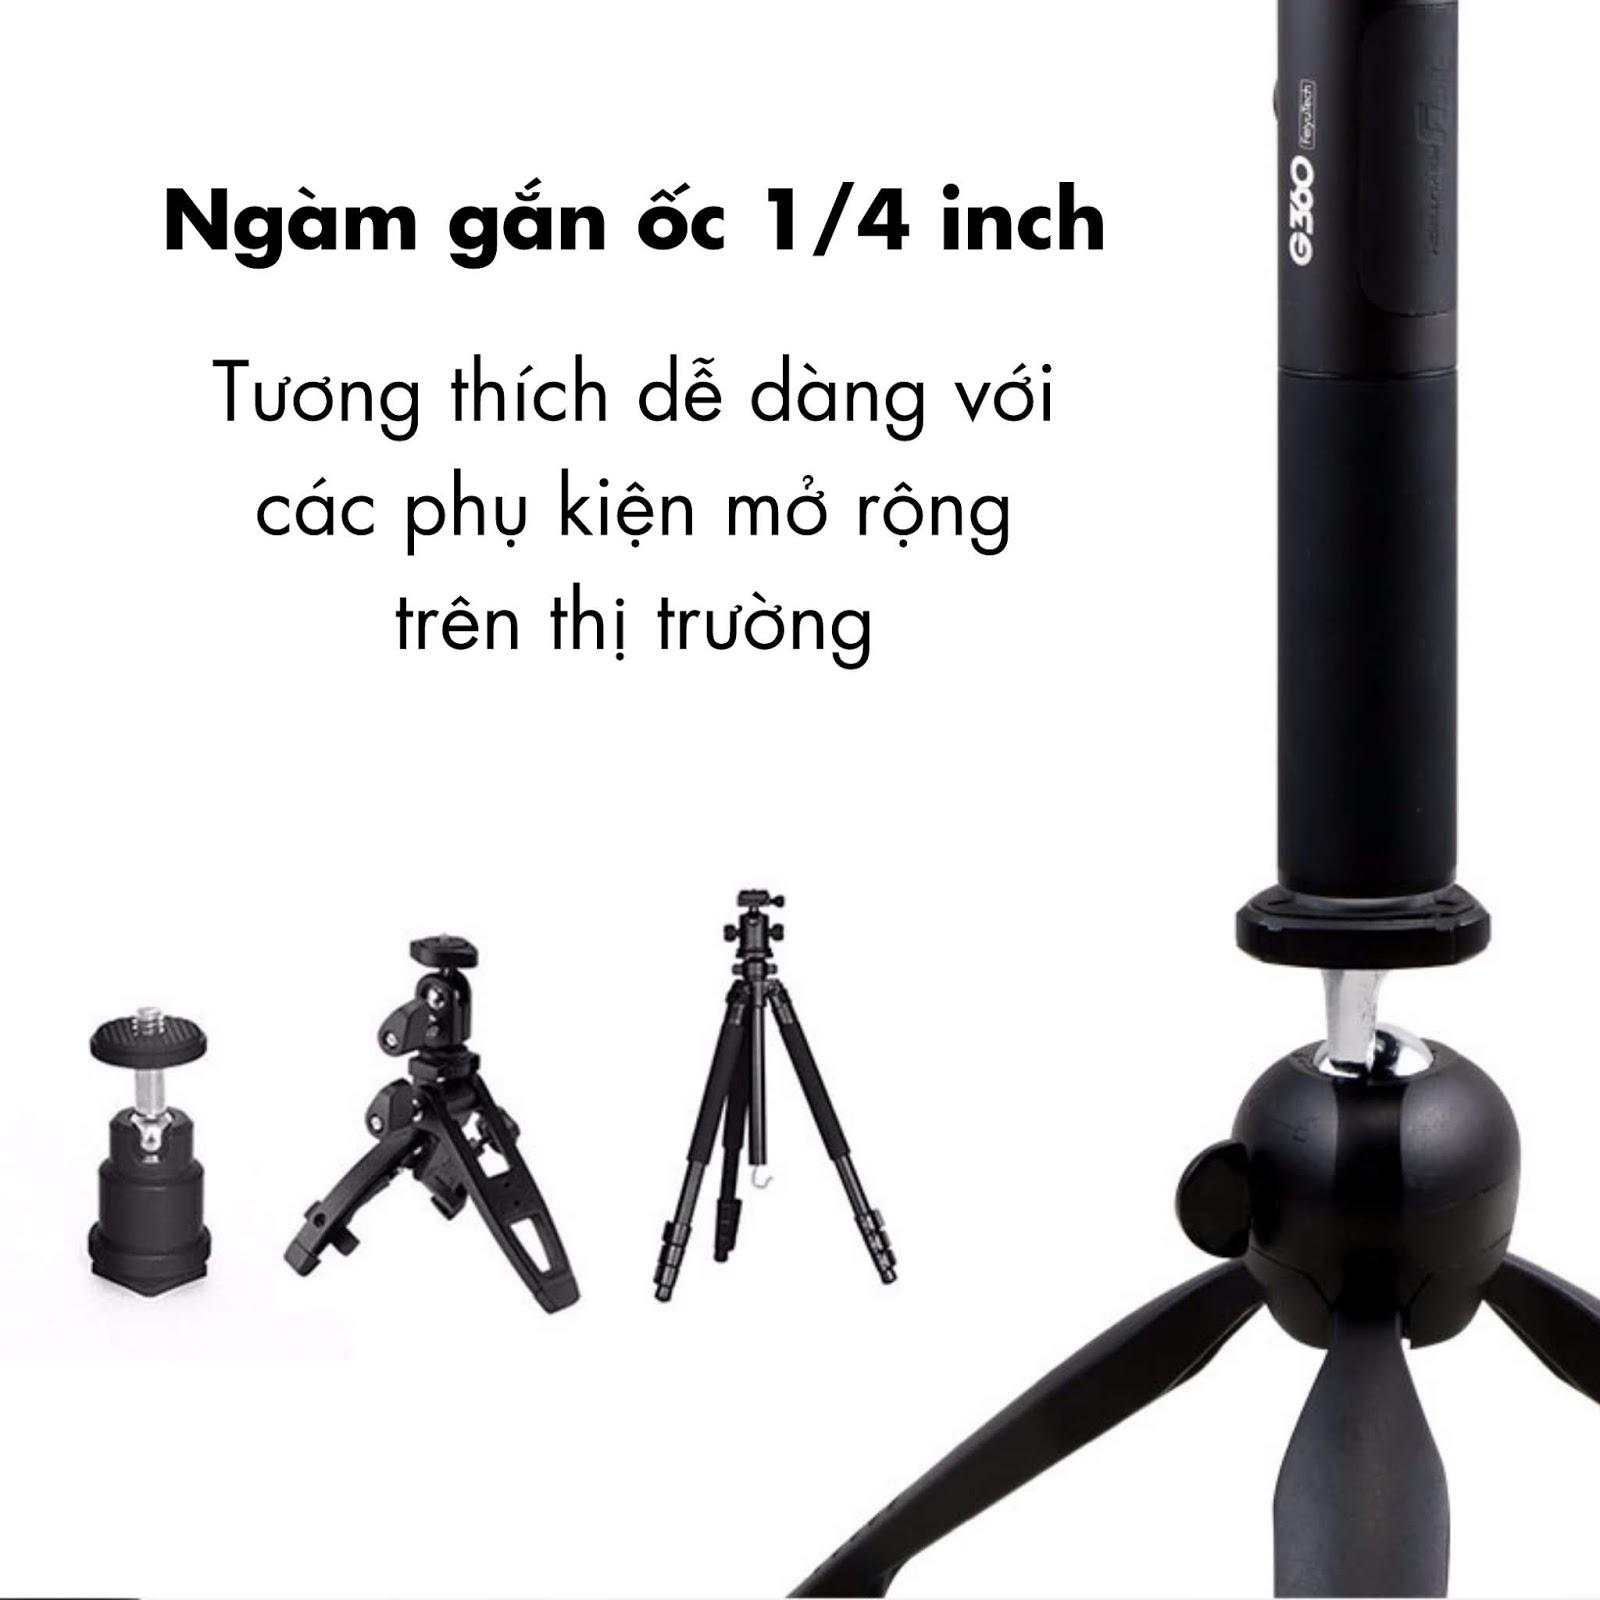 Gimbal chống rung camera 360 độ FeiyuTech G360